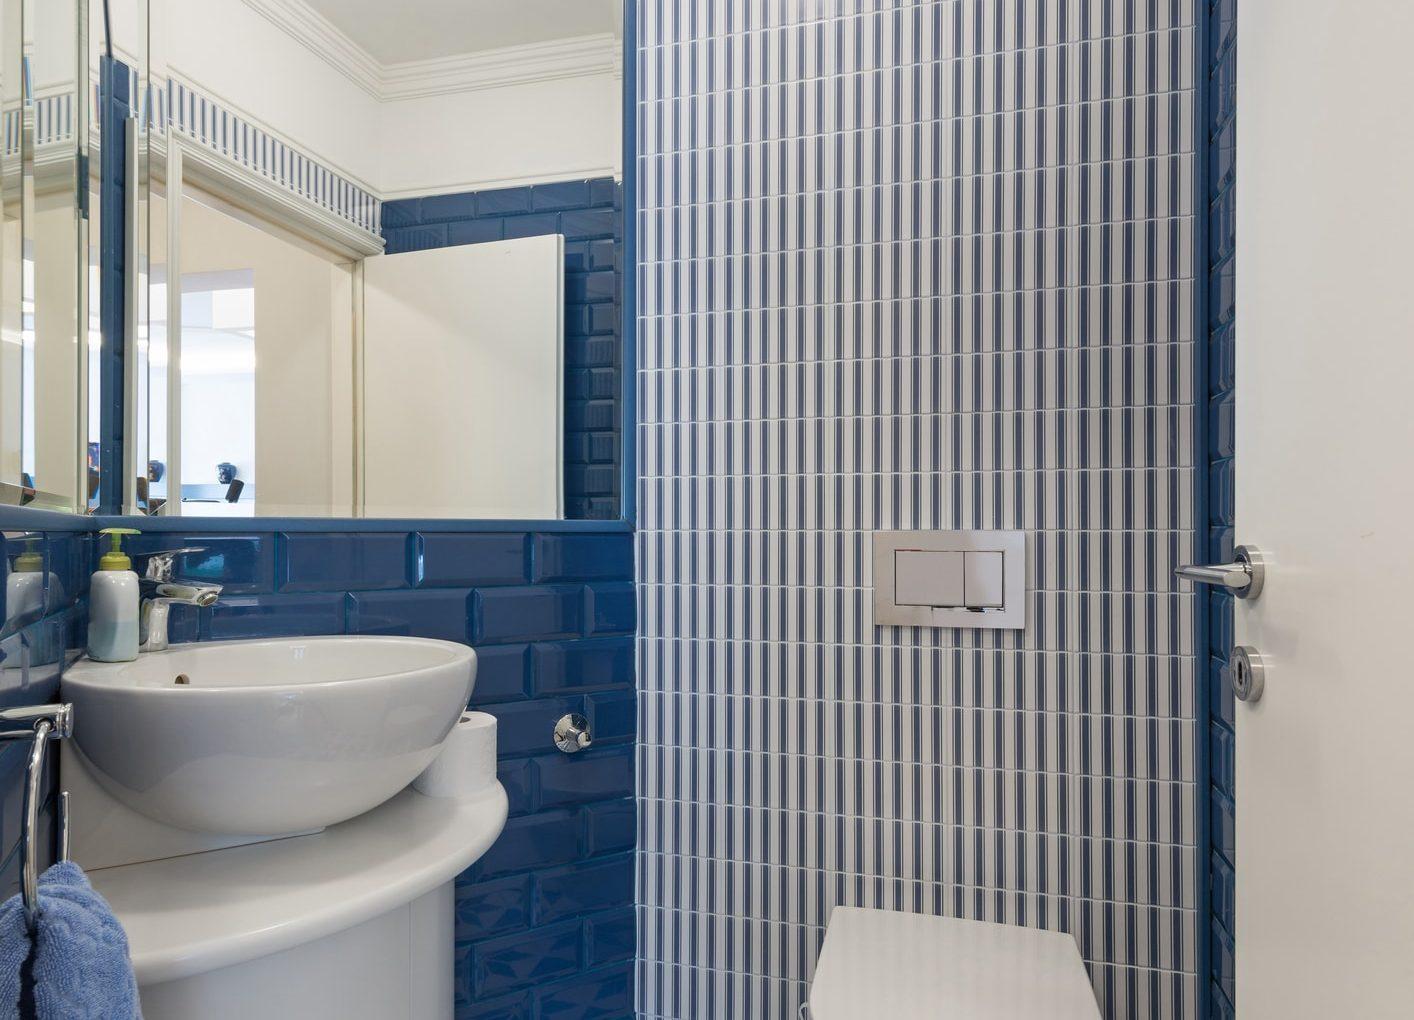 Salle De Bain Image petite salle de bain : comment aménager ? - nos conseils